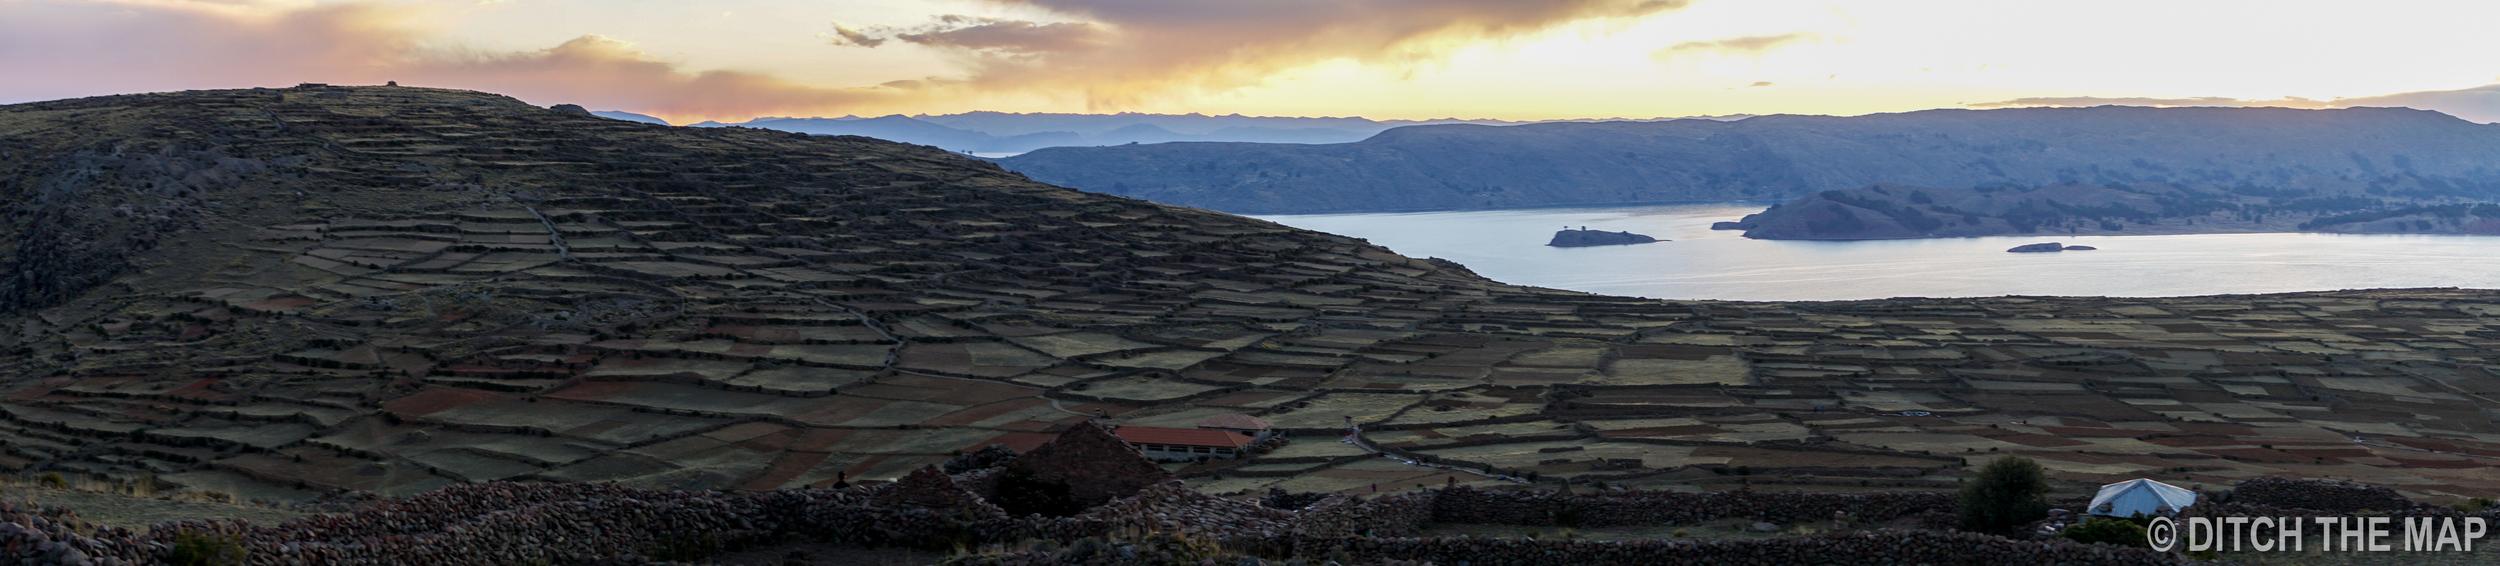 Watching the sunset on Amantani Island in Lake Titicaca in Puno, Peru